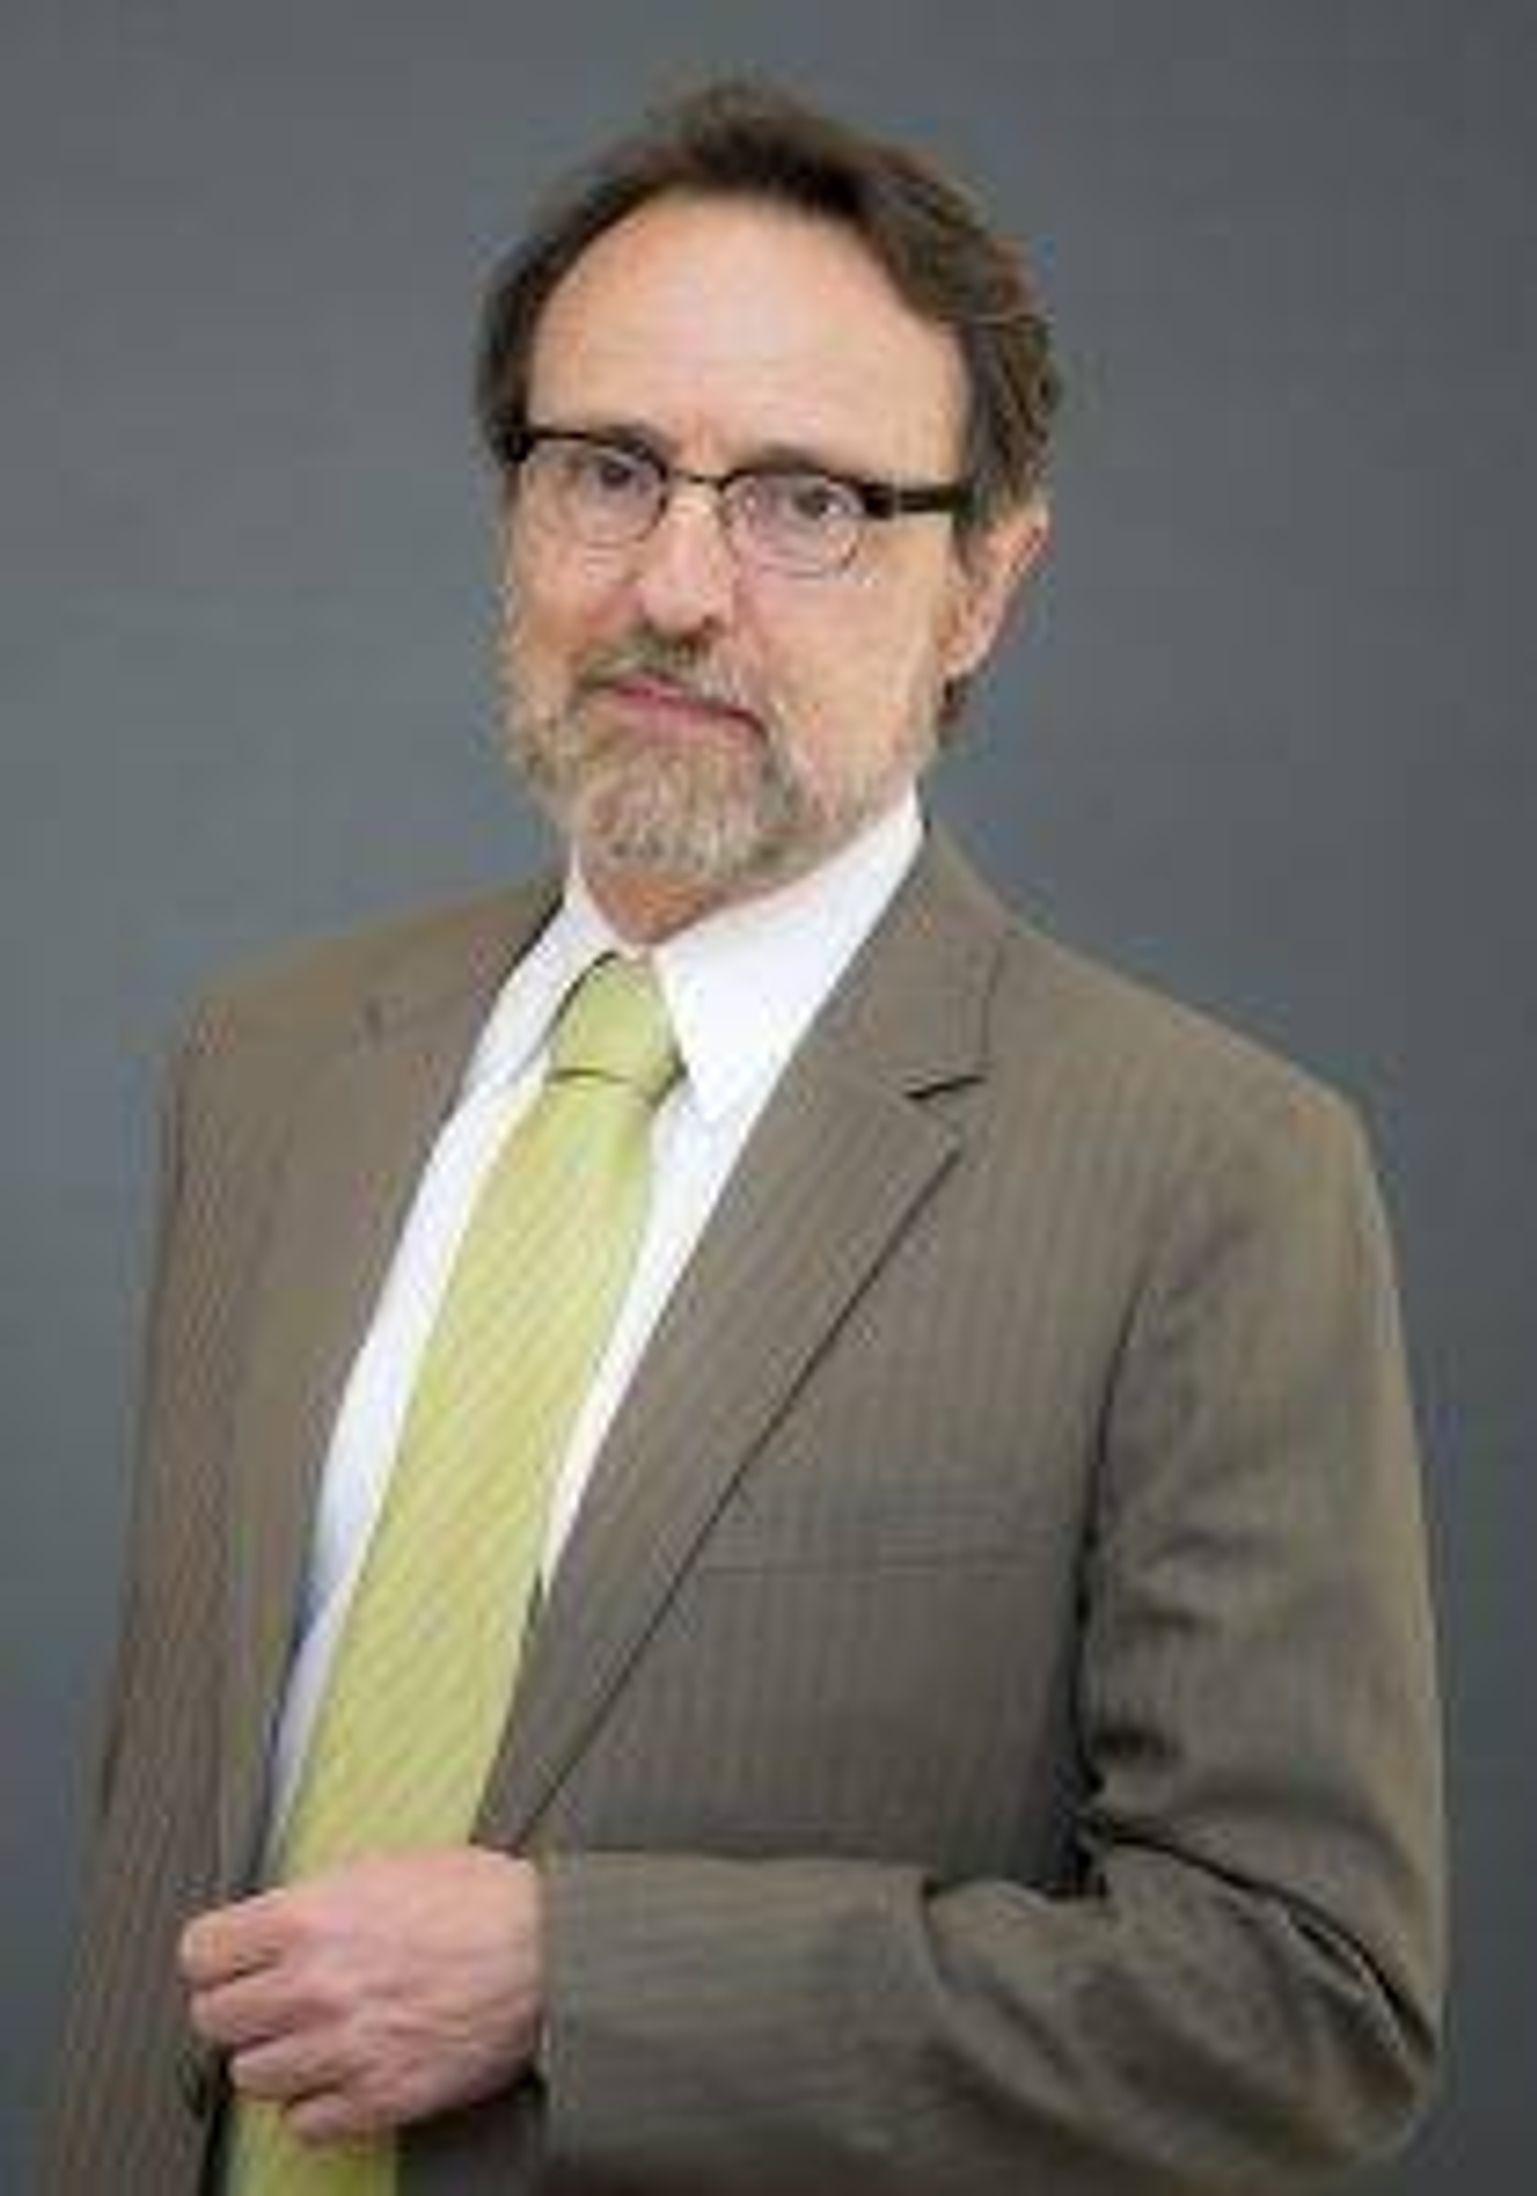 Wharton Prof. Peter Cappell